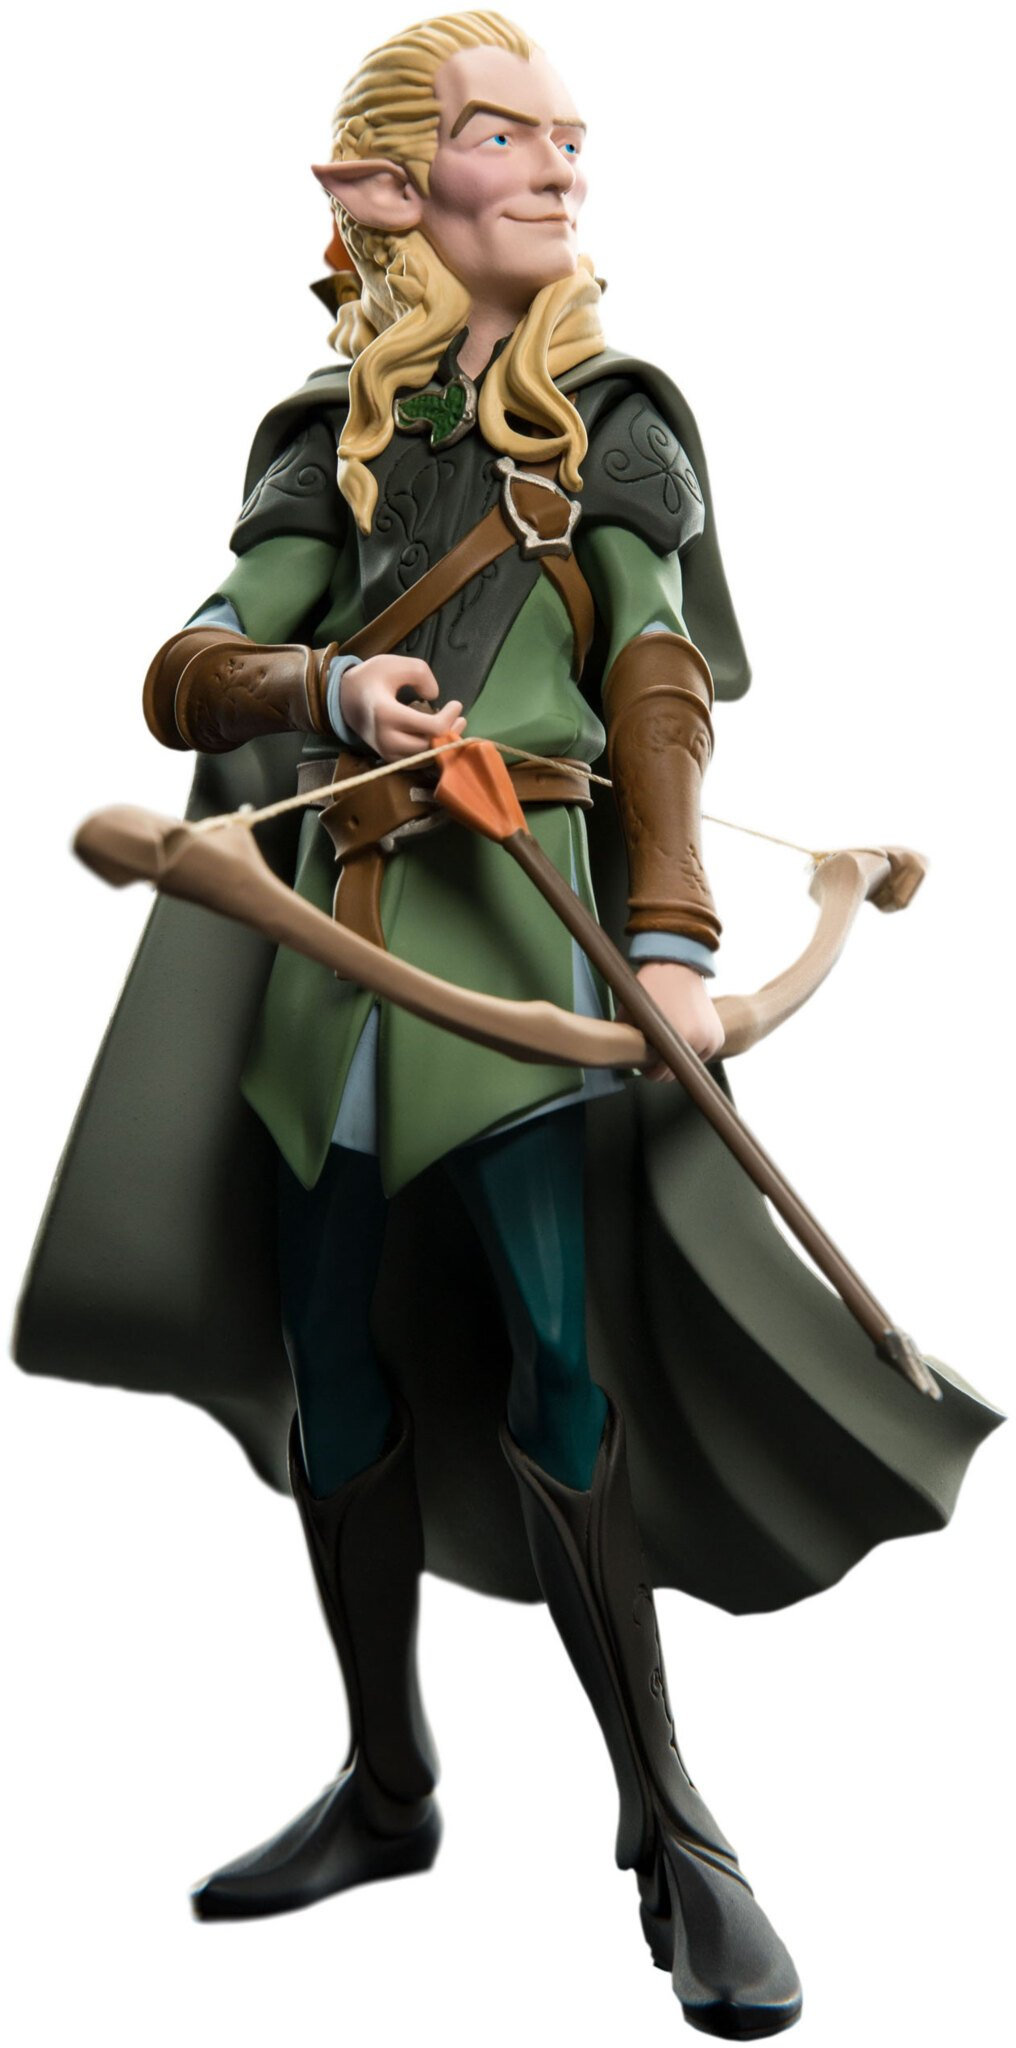 Lord of the Rings Mini Epics - Legolas